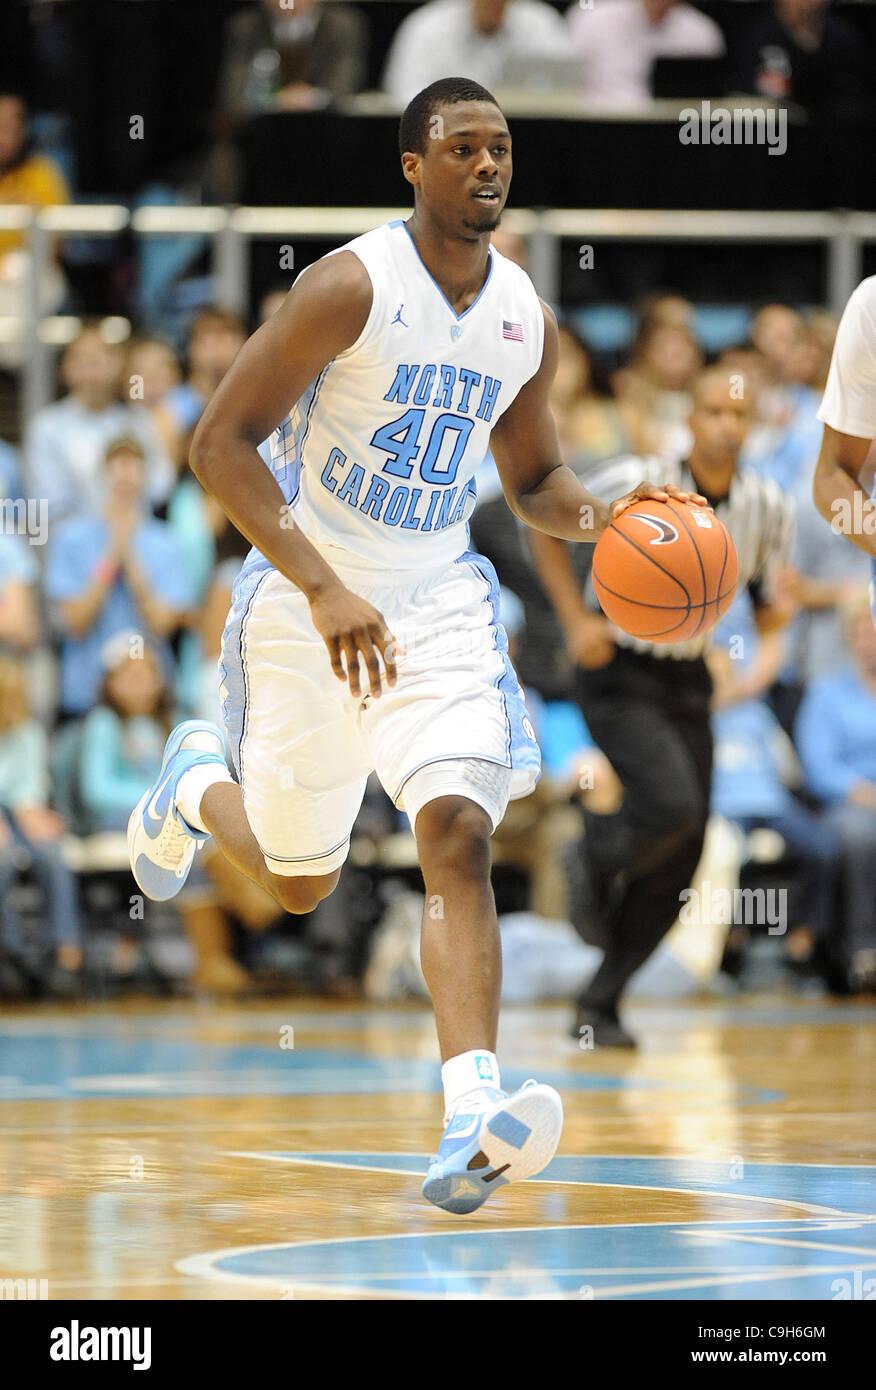 Jan. 01, 2012 - Chapel Hill, North Carolina; USA -  North Carolina Tarheels (40) HARRISON BARNES as the University - Stock Image